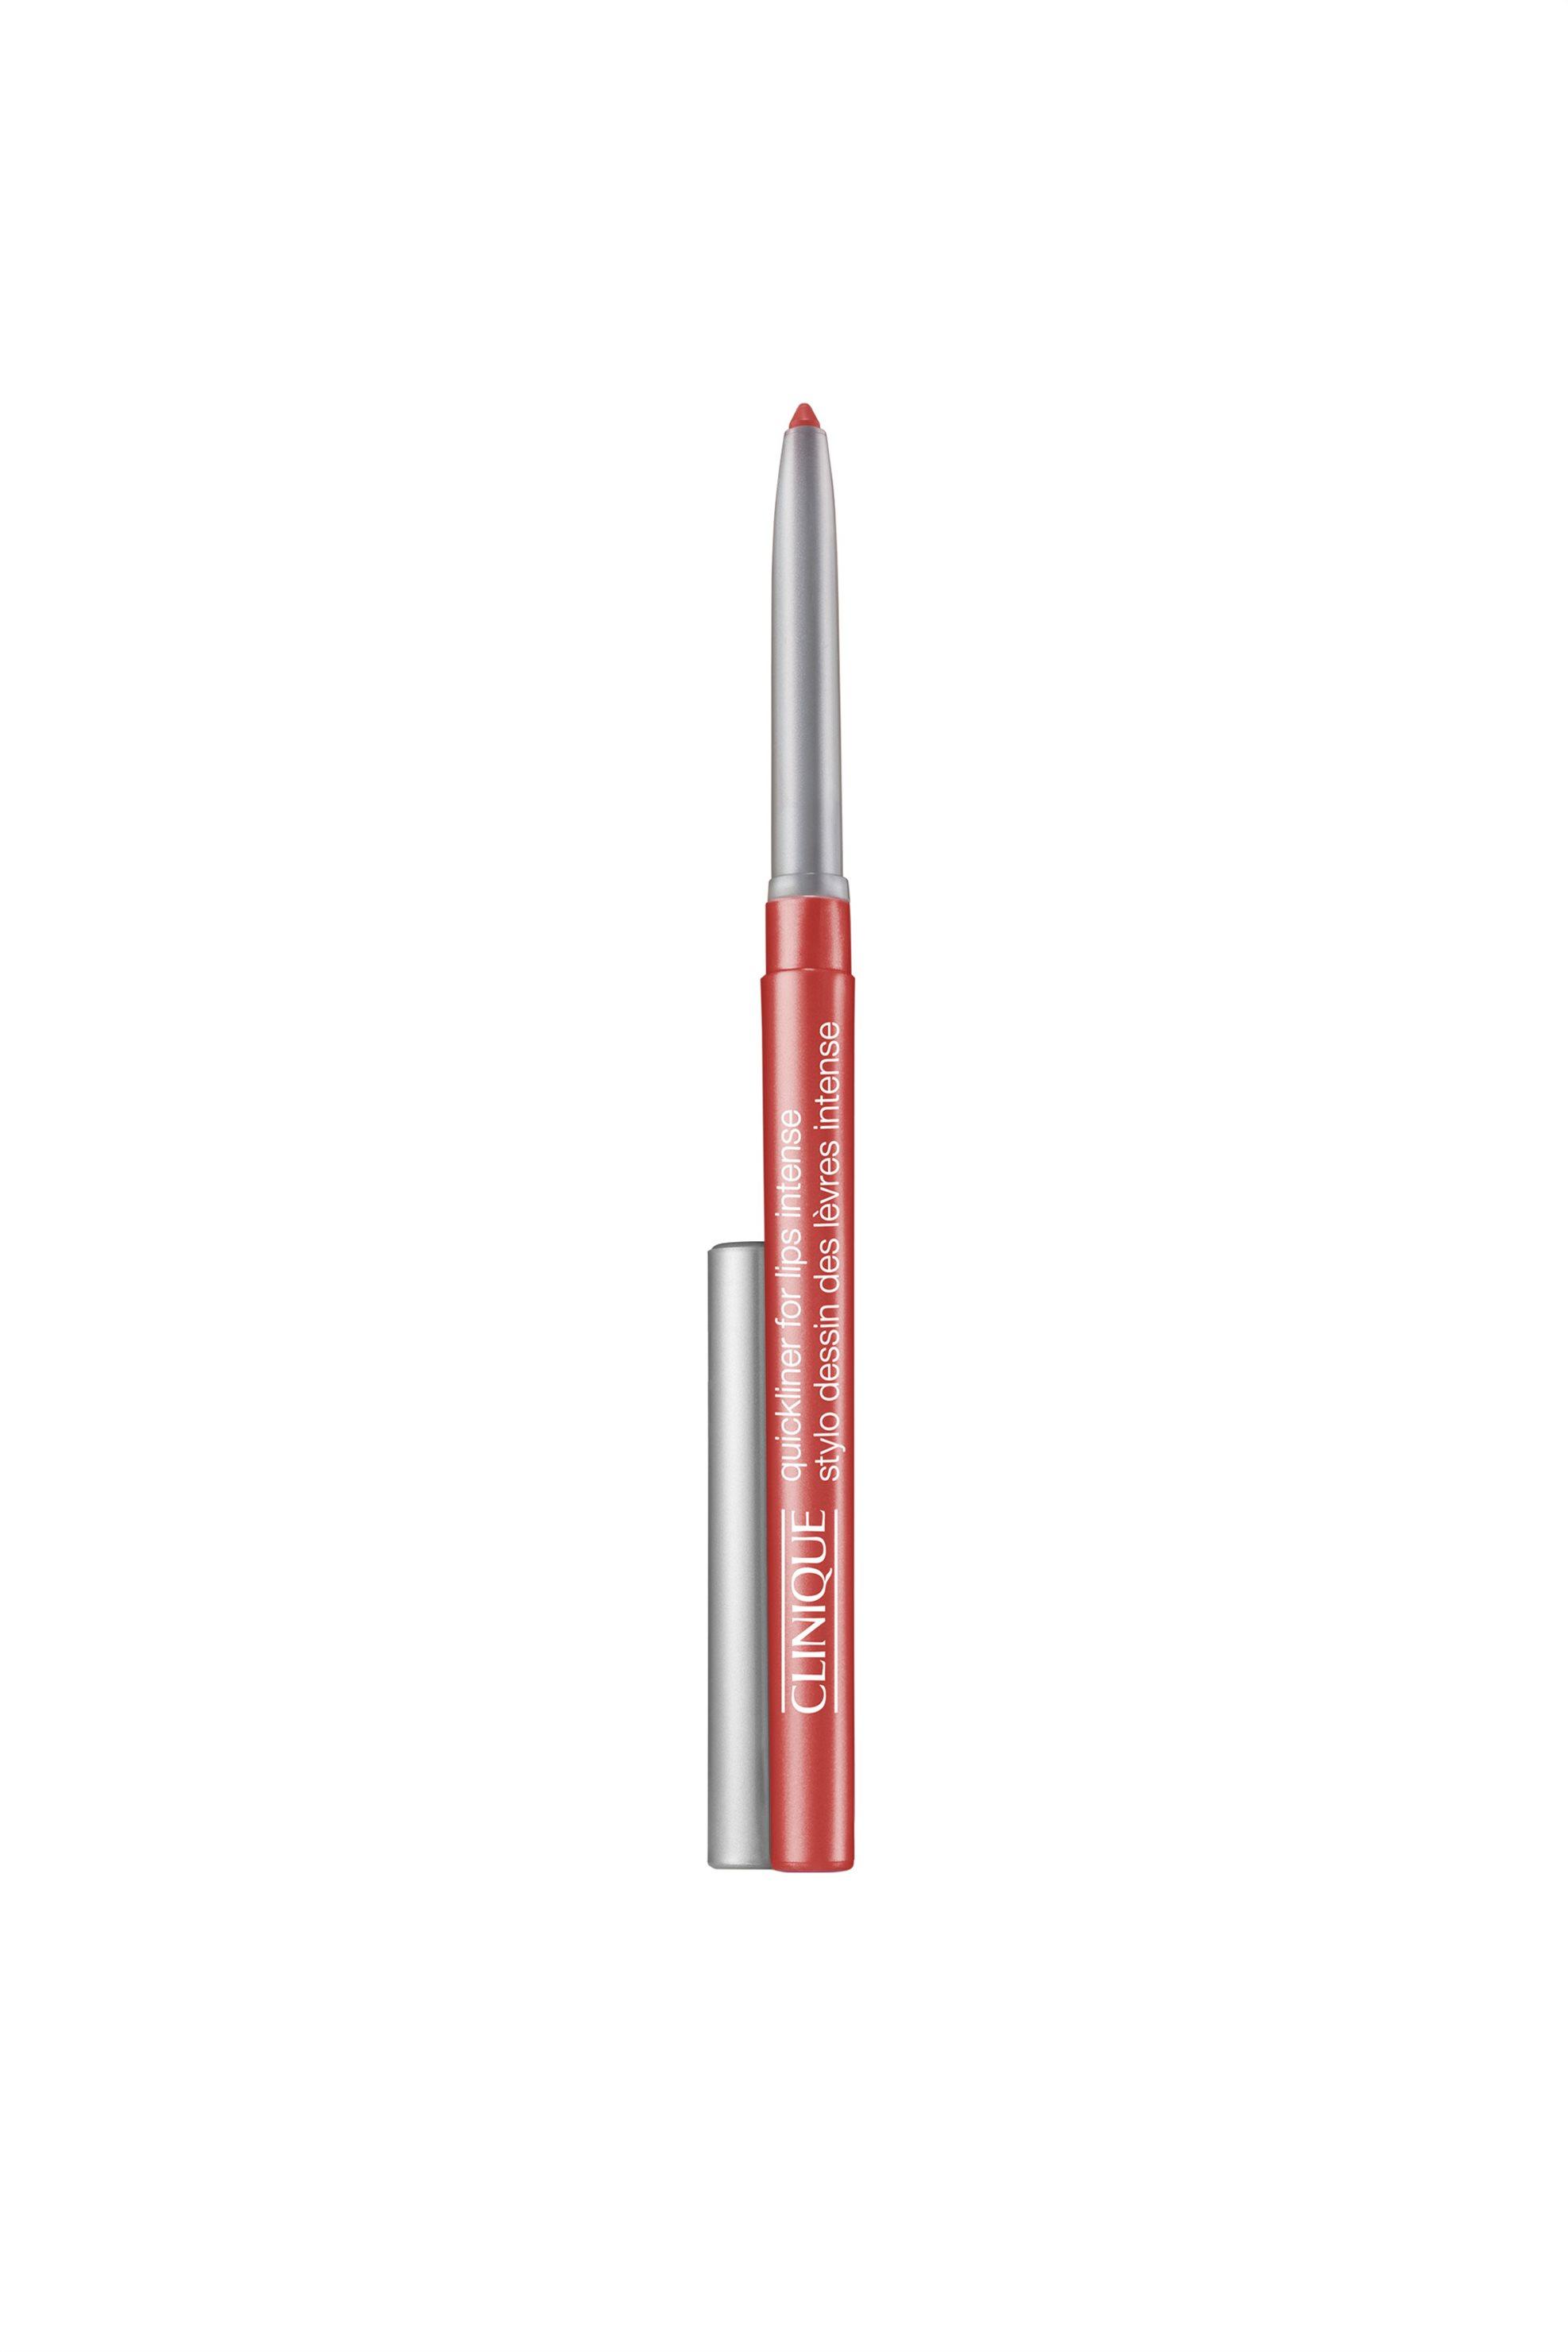 Clinique Quickliner™ for Lips Intense 04 Intense Cayenne 0.3 gr. - ZGGY040000 ομορφια   καλλυντικα επιλεκτικησ   μακιγιάζ   χείλη   μολύβια χειλιών